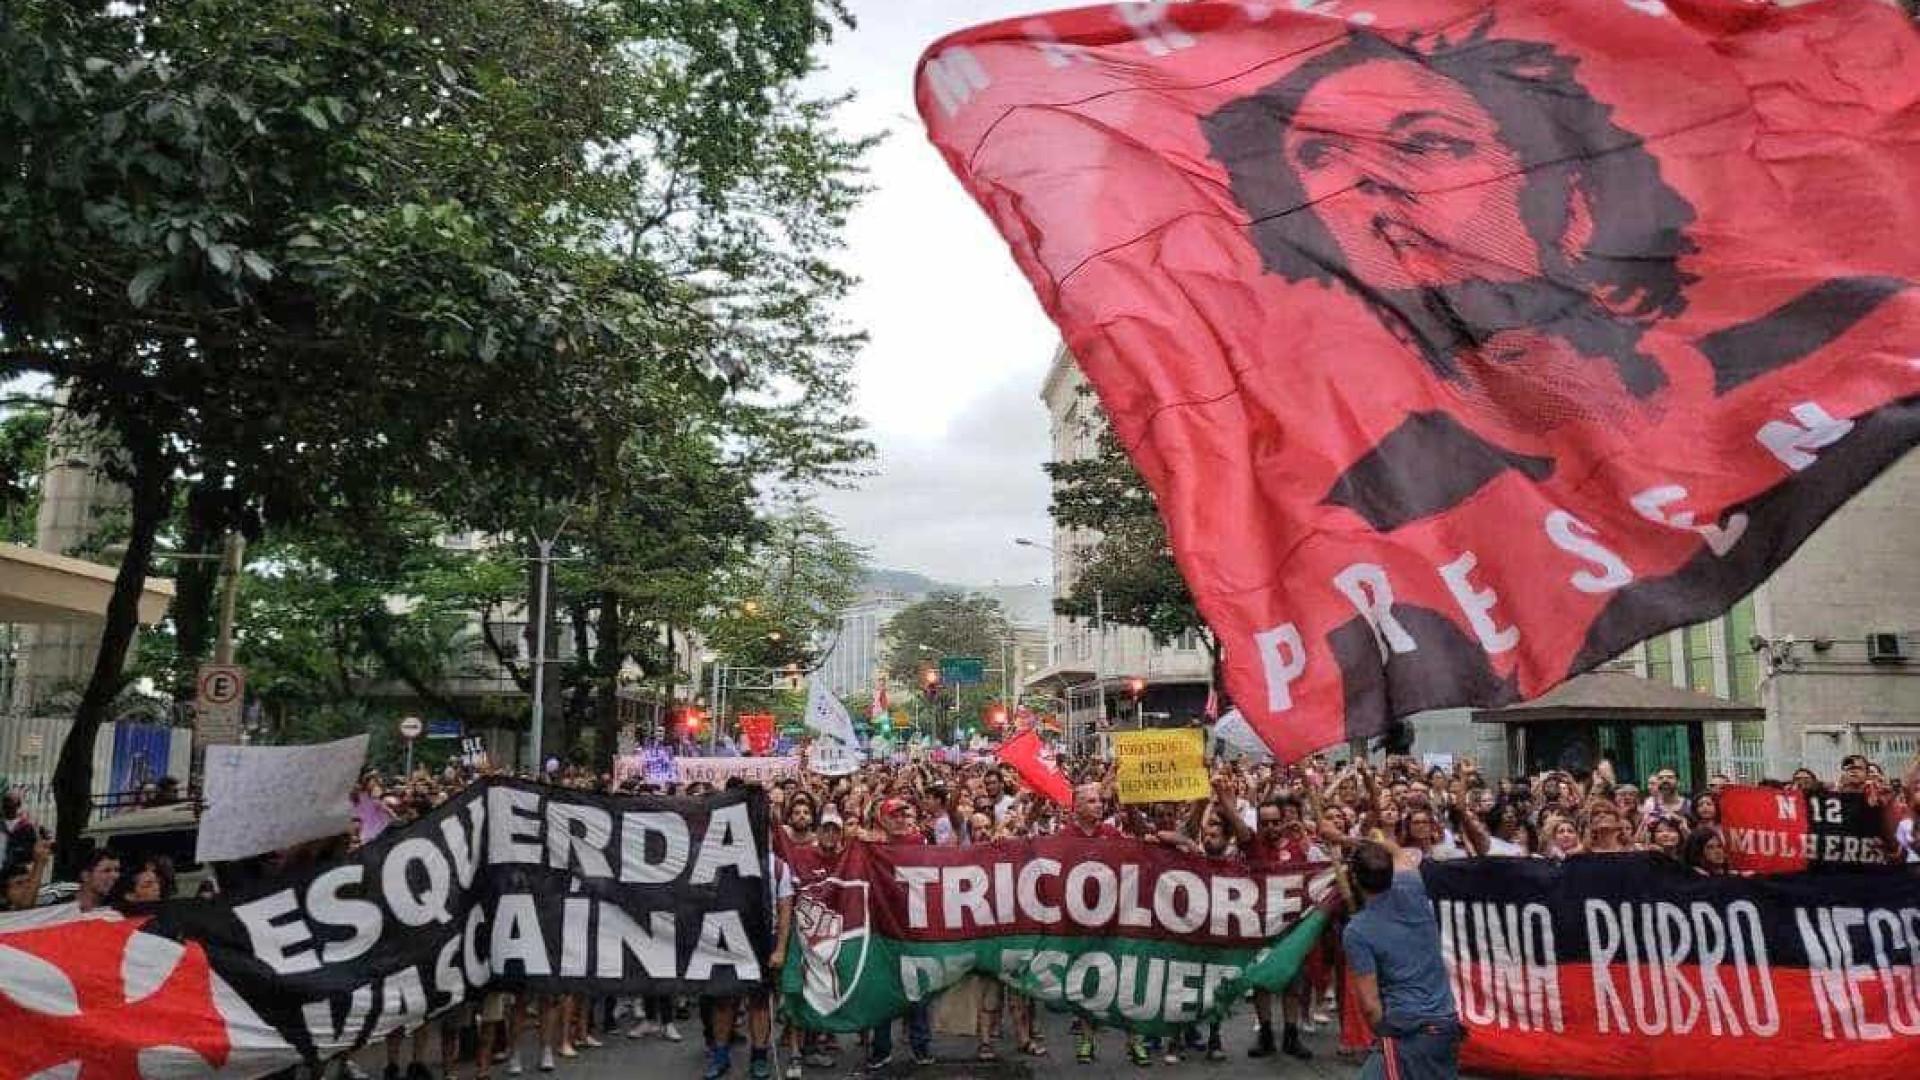 No Rio, ato contra Bolsonaro une torcedores de Fla, Flu, Vasco e Bota